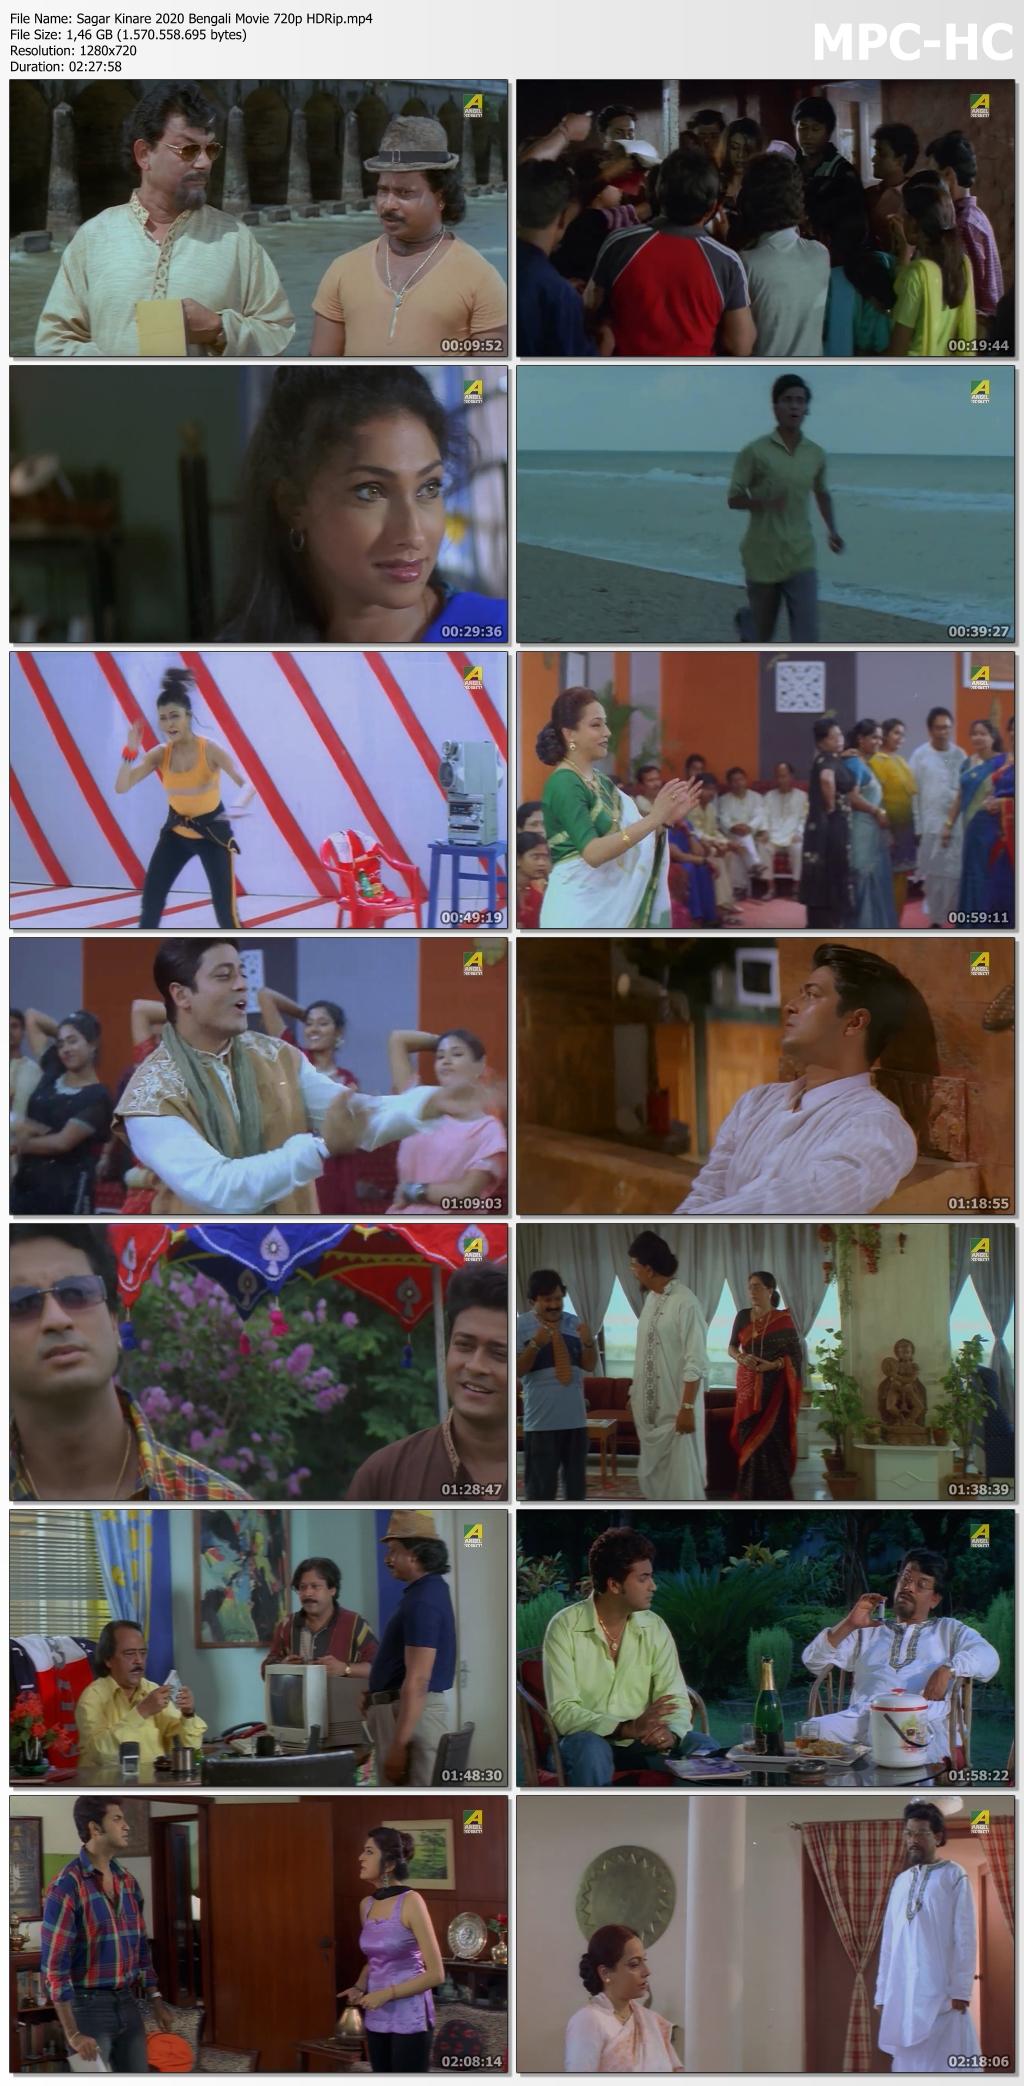 Sagar-Kinare-2020-Bengali-Movie-720p-HDRip-mp4-thumbs